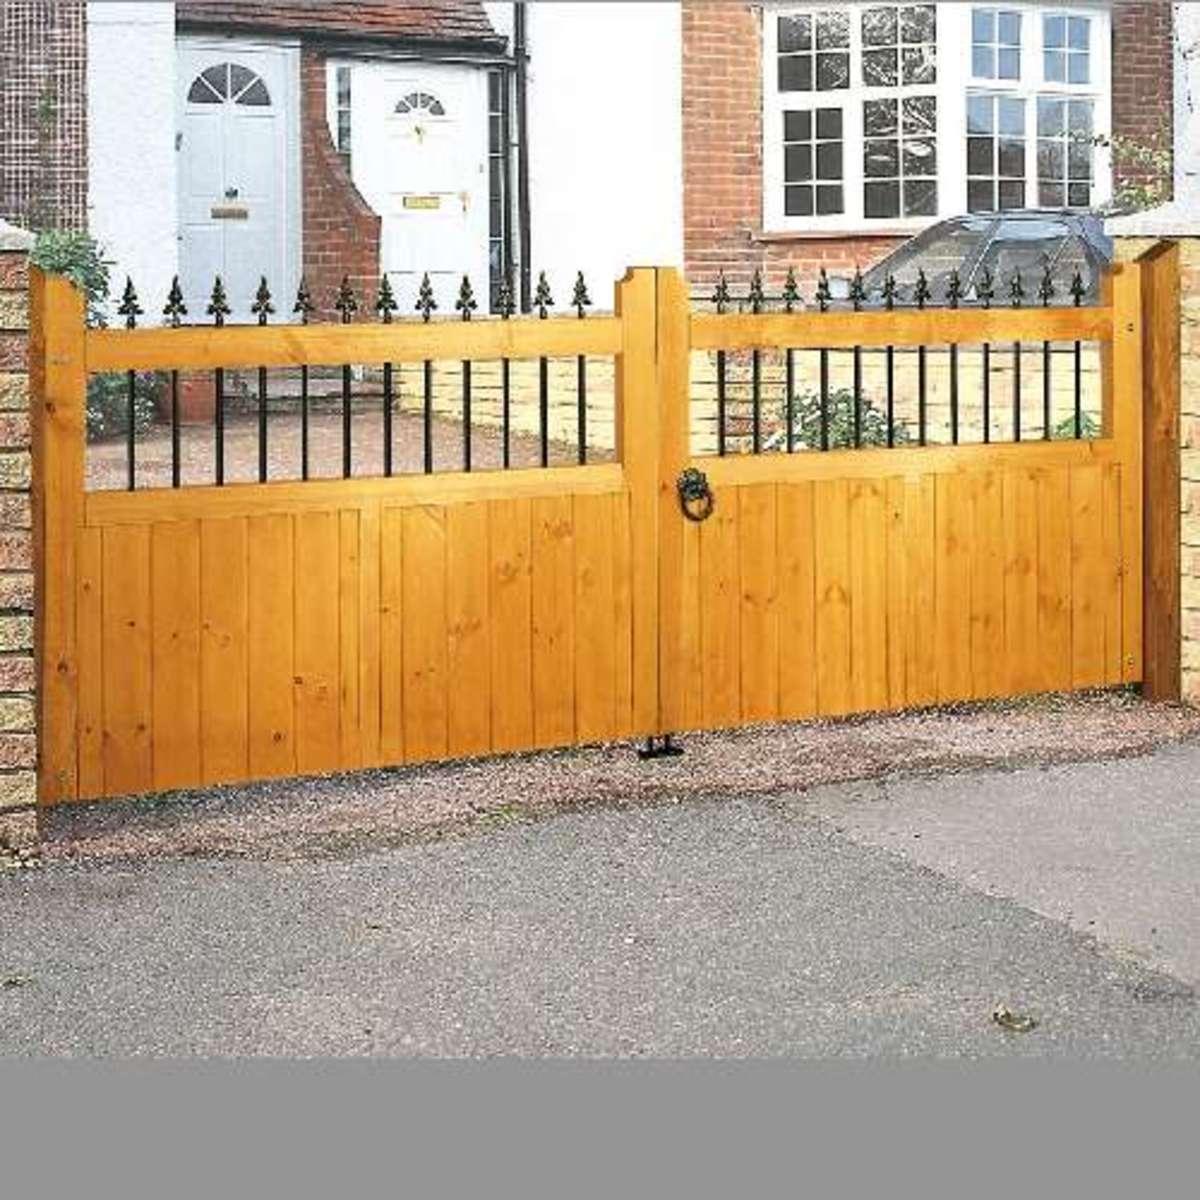 Wooden gates - Wooden driveway gates - Vertifleur double gate